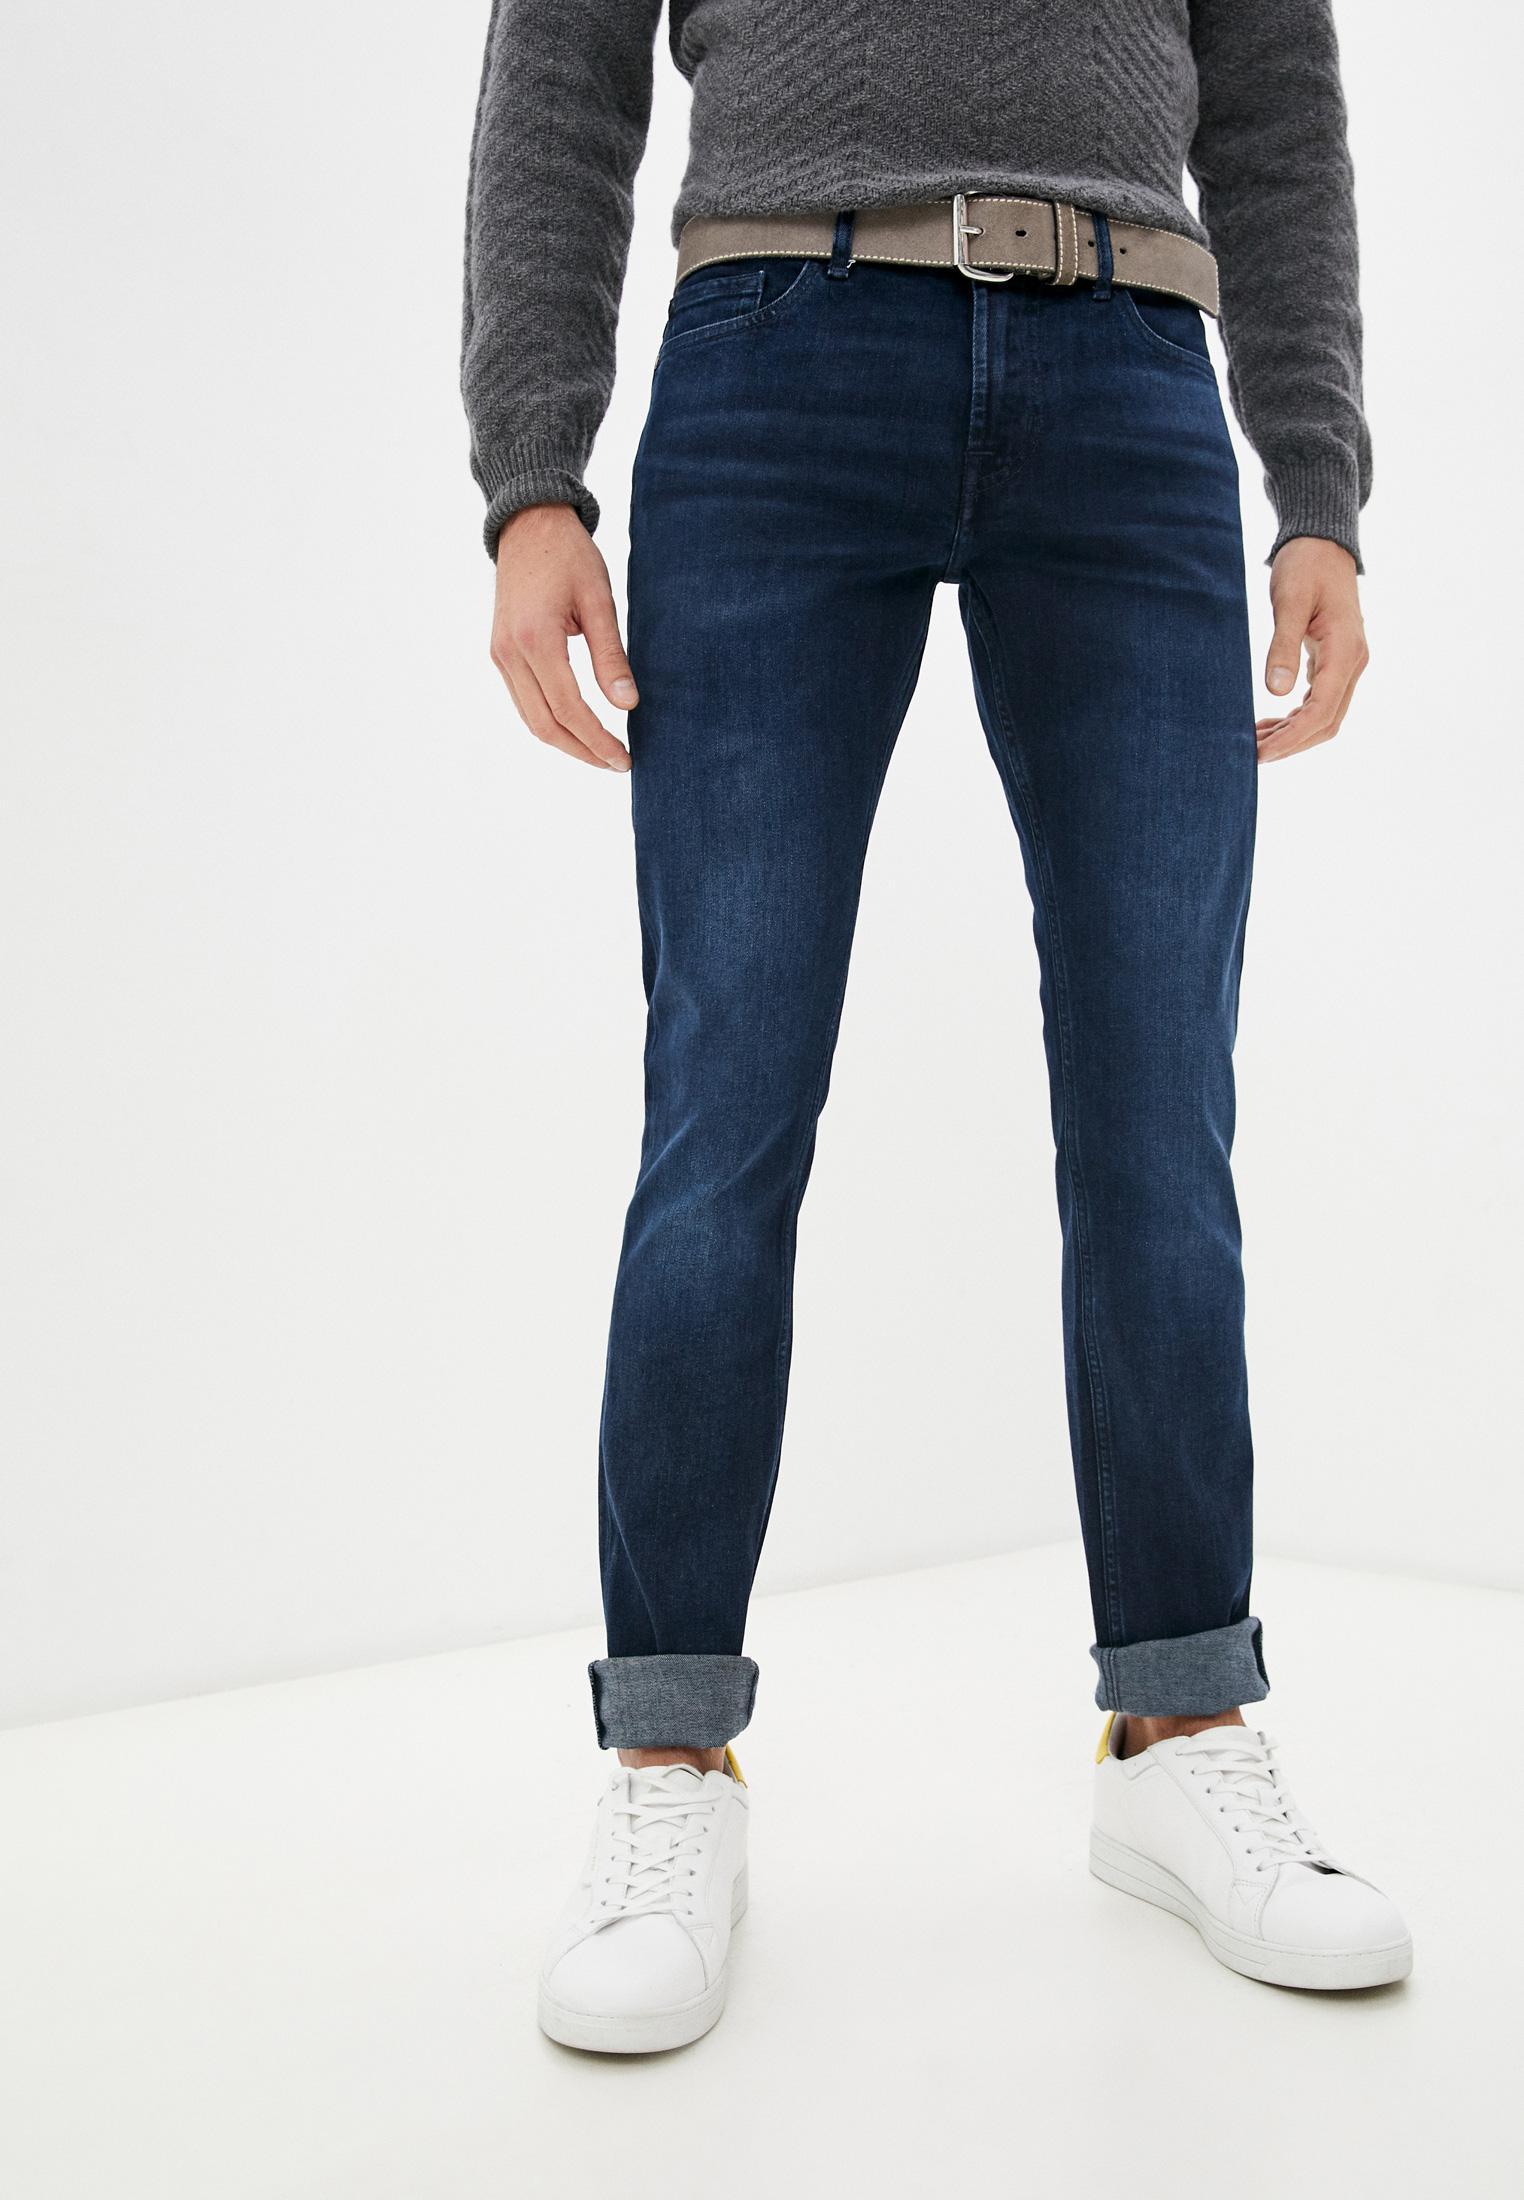 Зауженные джинсы 7 For All Mankind (7 Фо Олл Мэнкайнд) JSD4R460LL: изображение 1